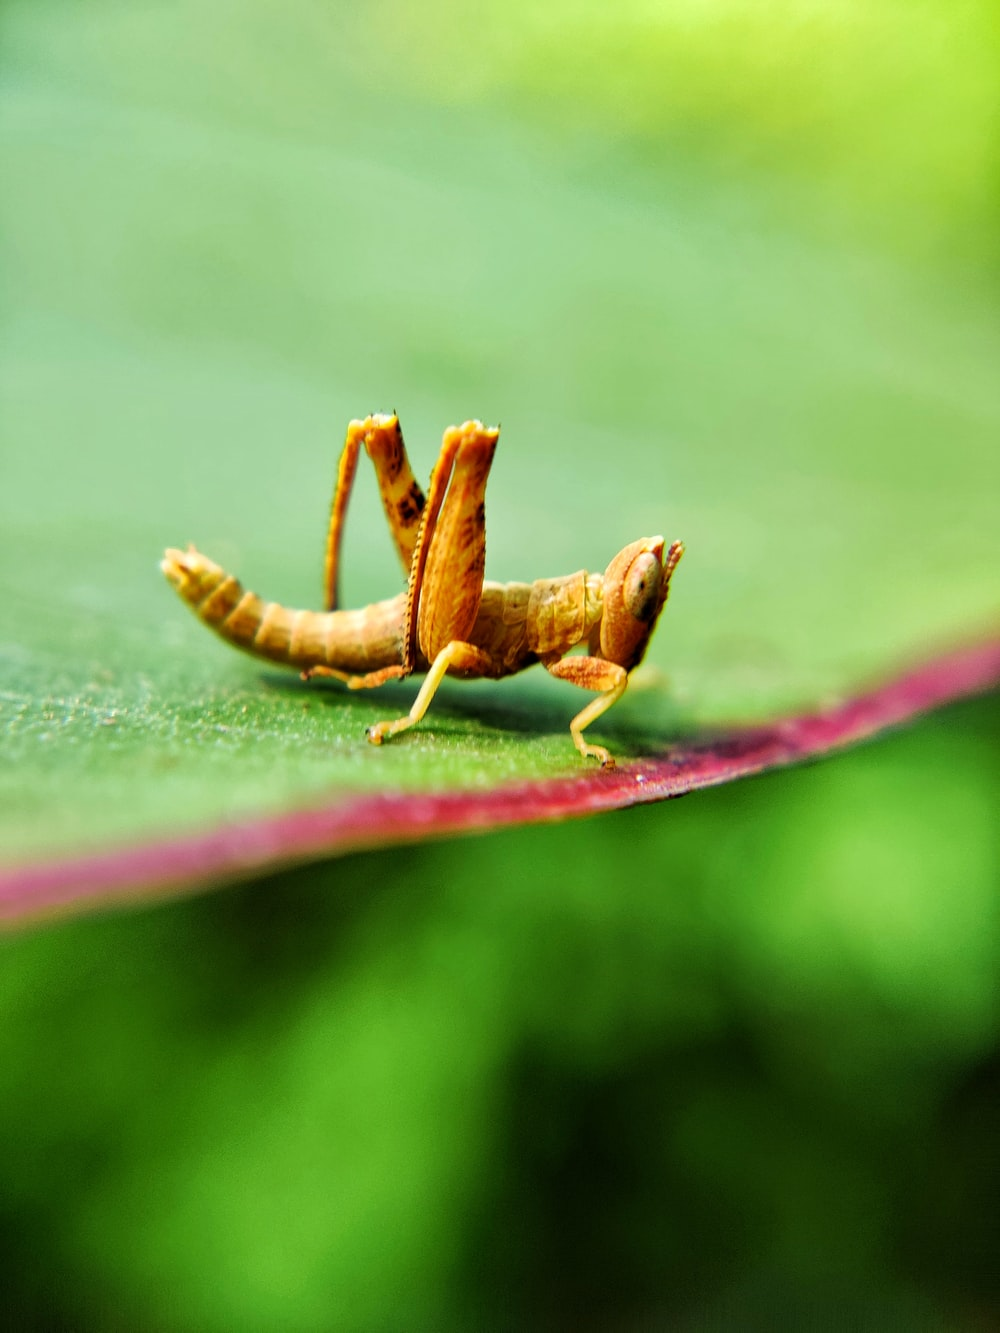 brown grasshopper on leaf